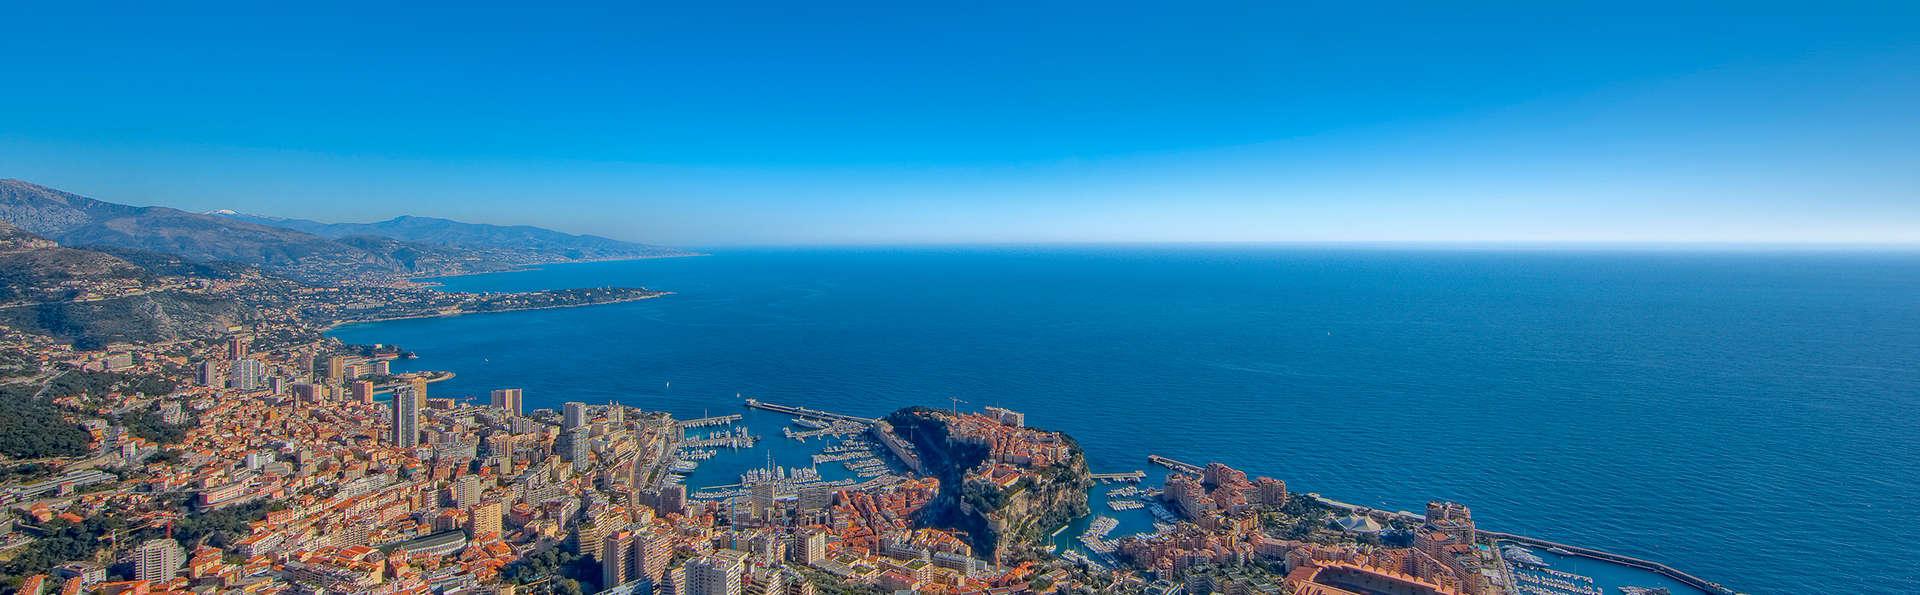 Columbus Monte-Carlo - Edit_Destination2.jpg